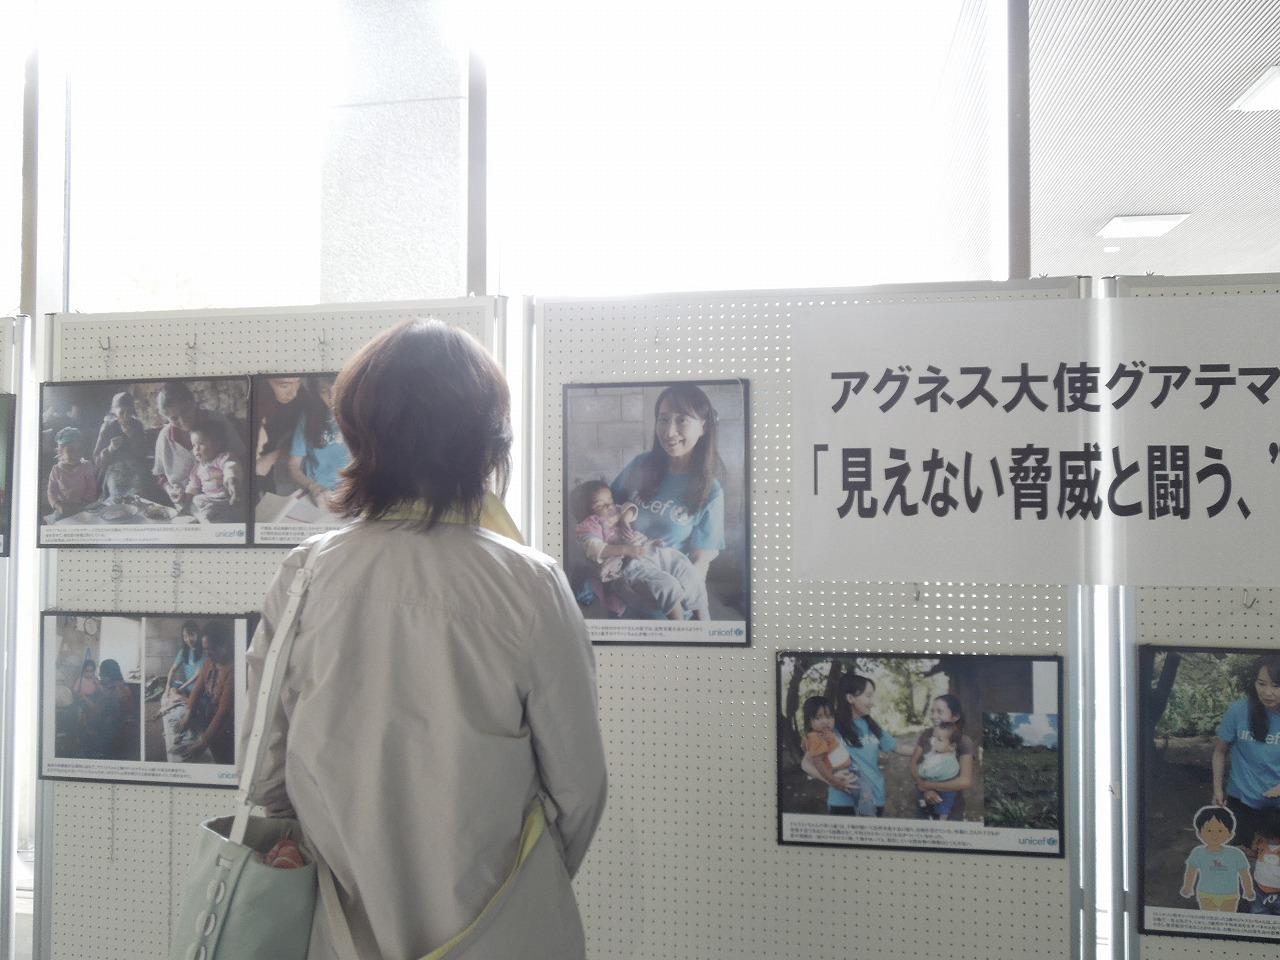 http://www.unicef-hokkaido.jp/img/%E5%86%99%E7%9C%9F.jpg